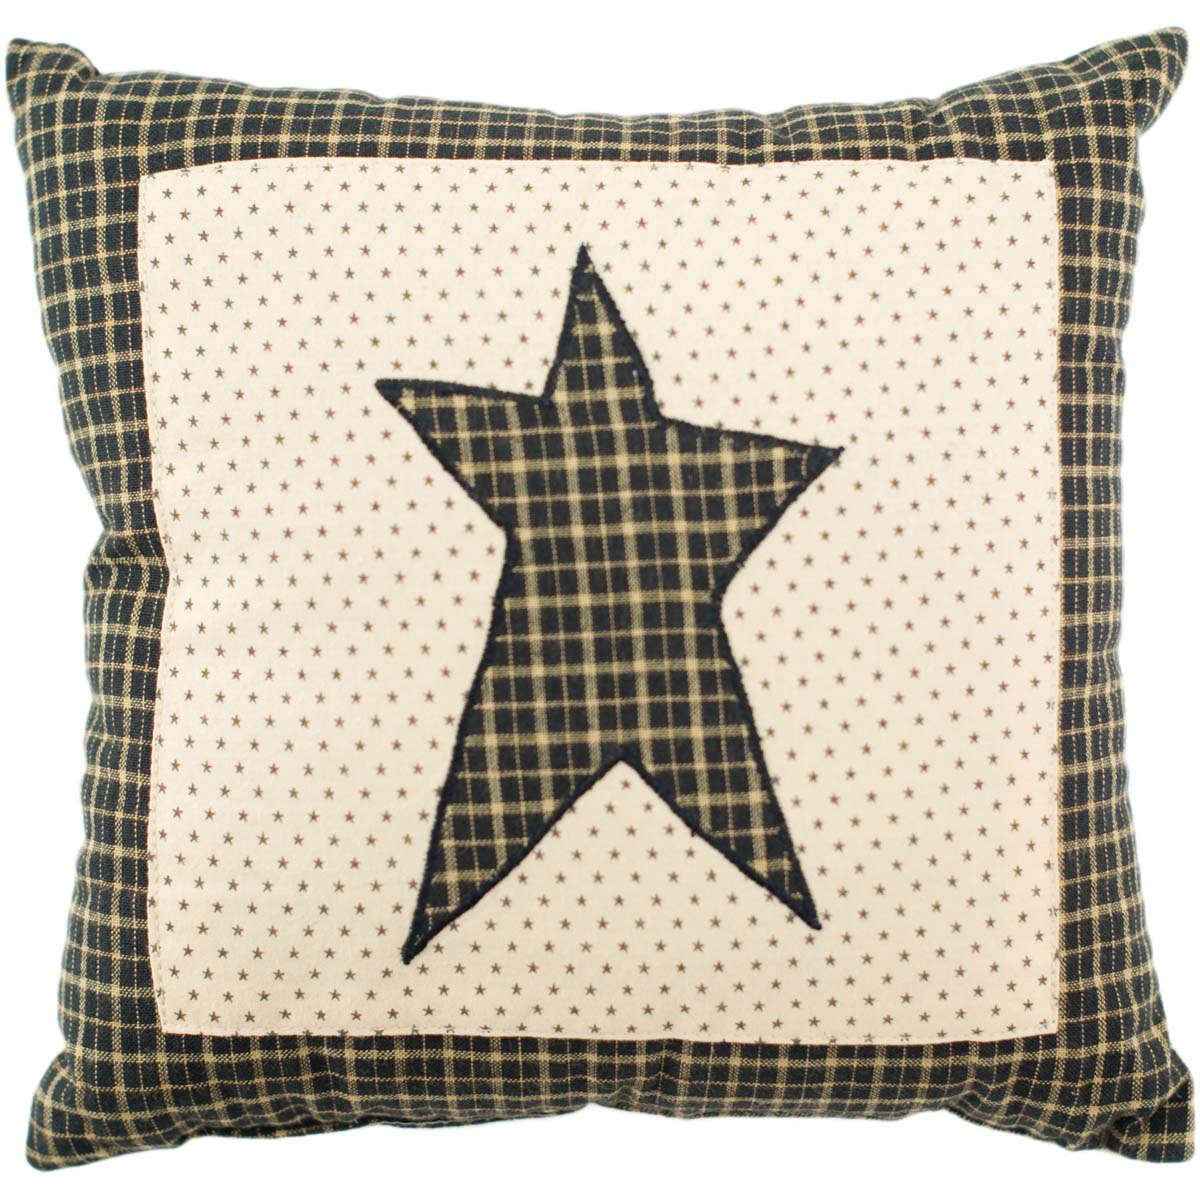 Country Black Primitive Bedding Prim Grove Star Cotton Appliqued Square Pillow